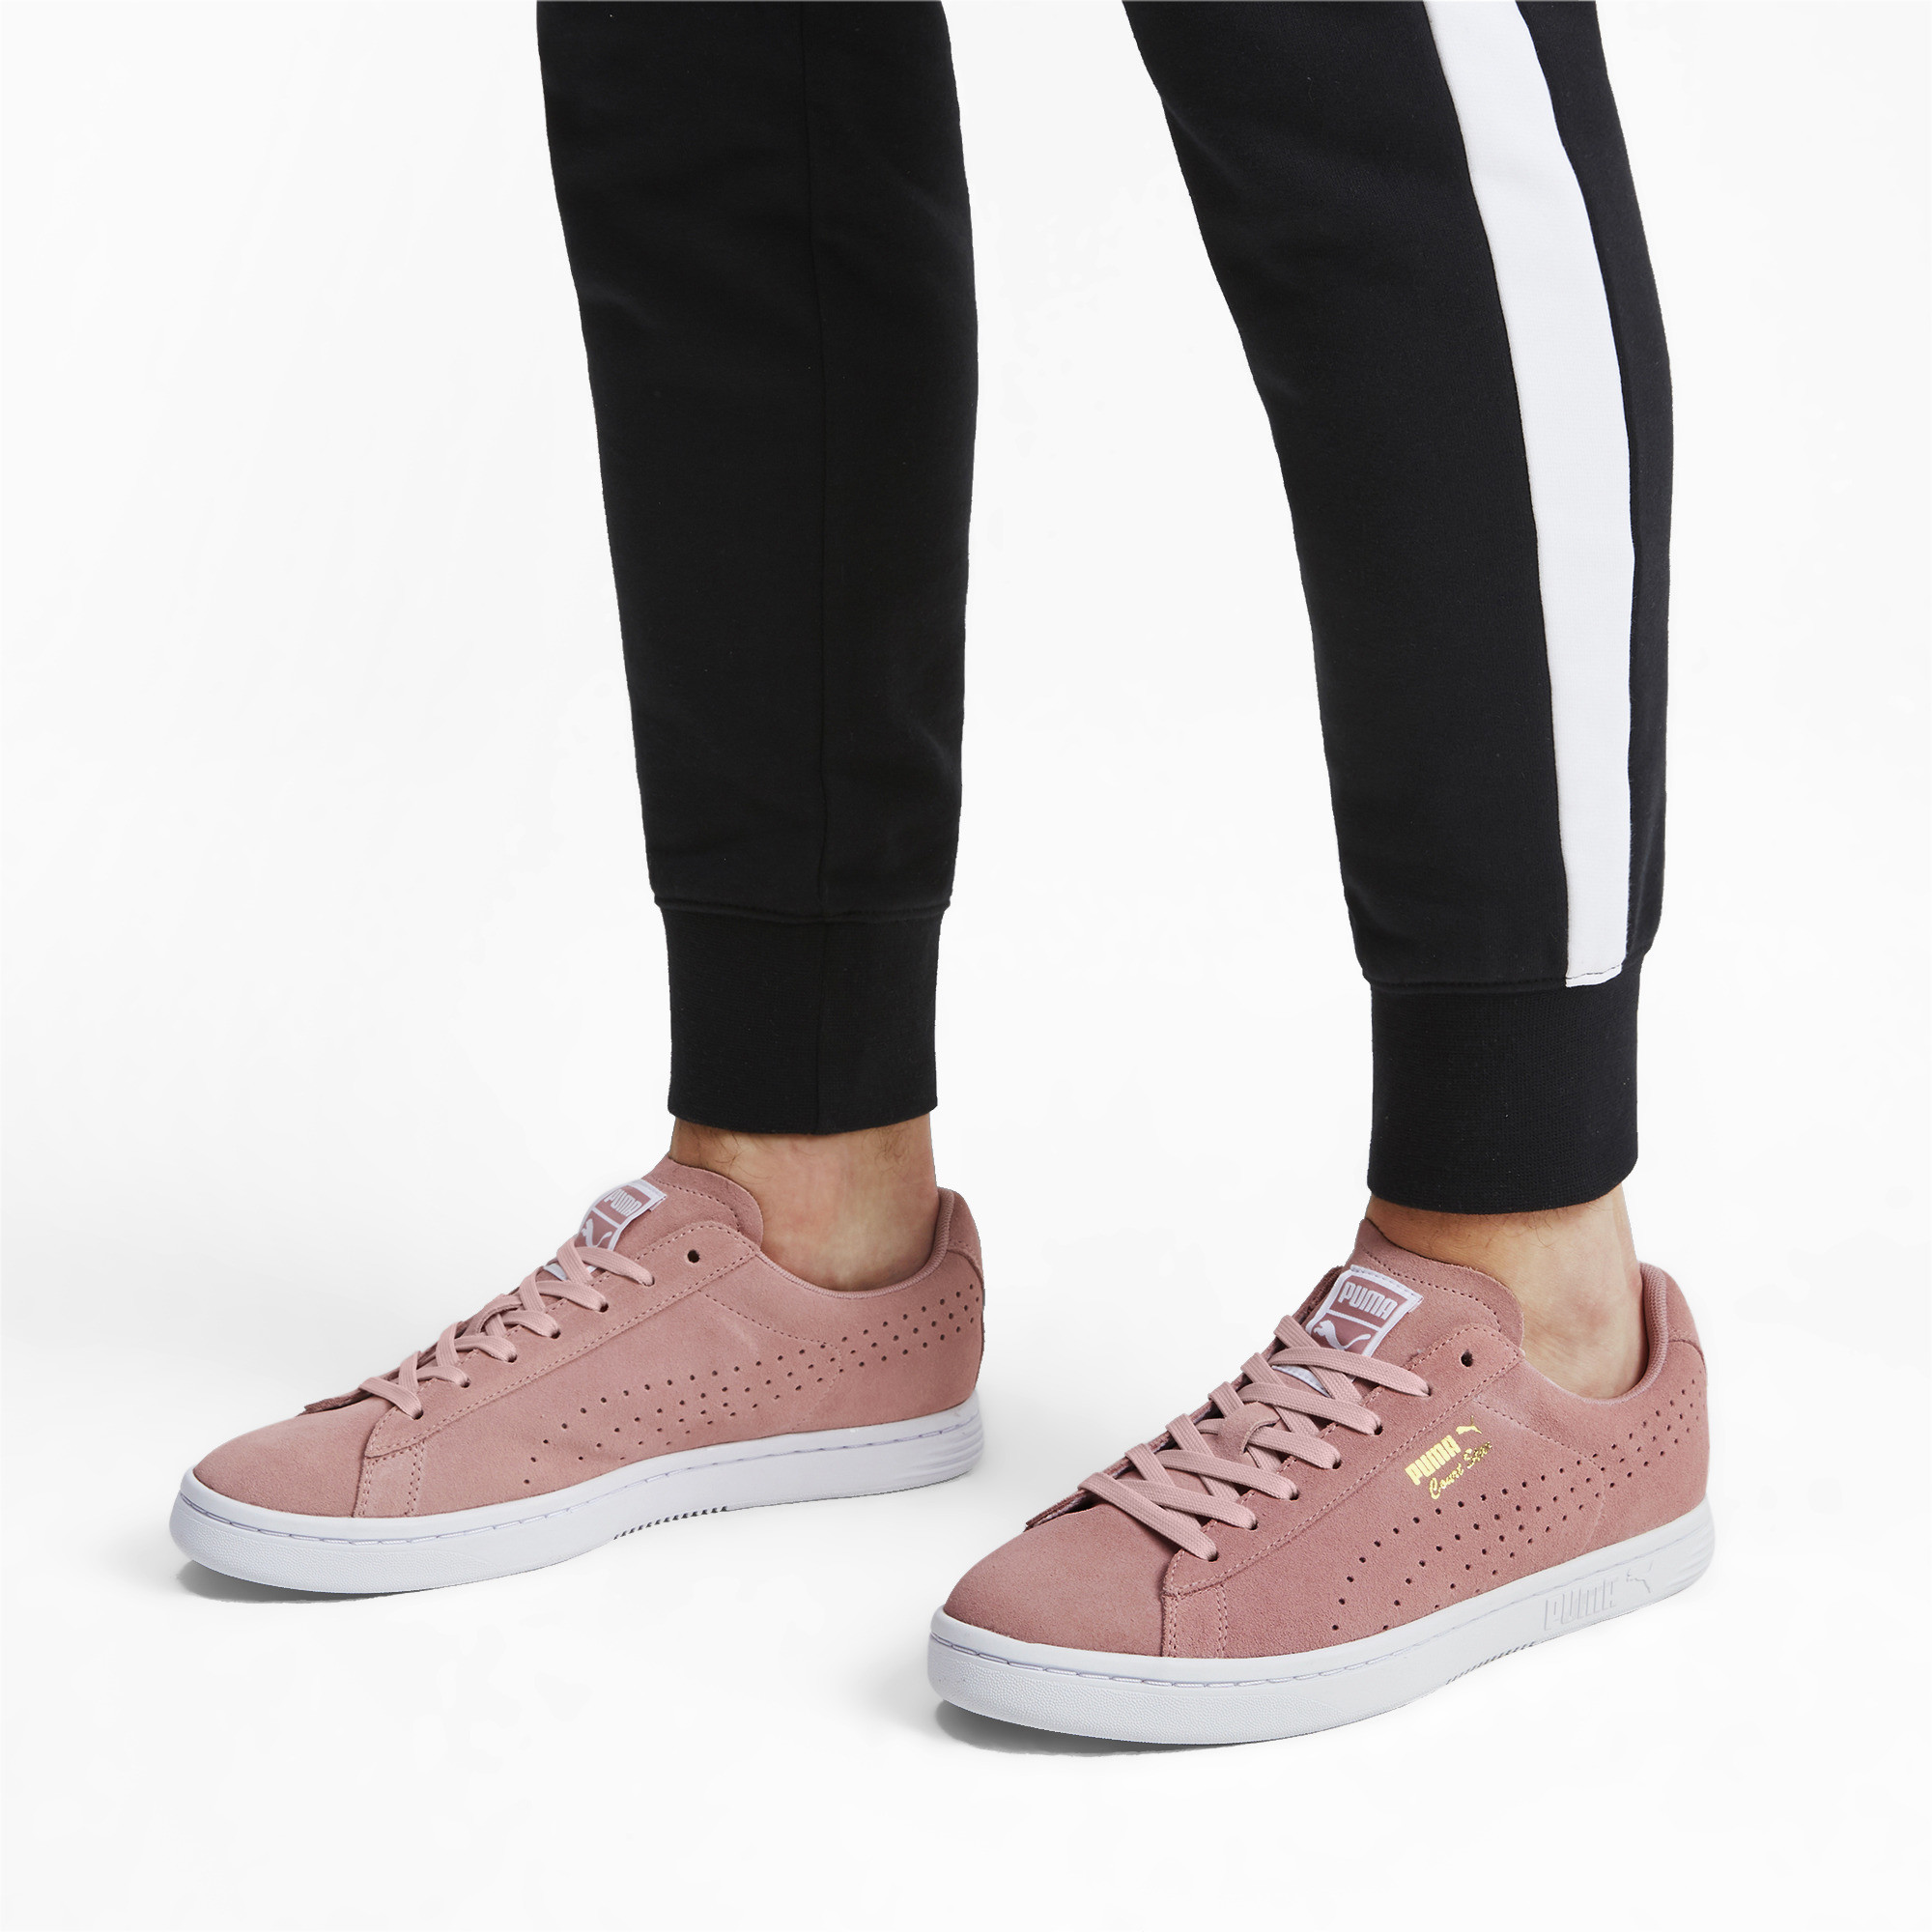 PUMA-Court-Star-Suede-Sneakers-Unisex-Shoe-Sport-Classics thumbnail 5